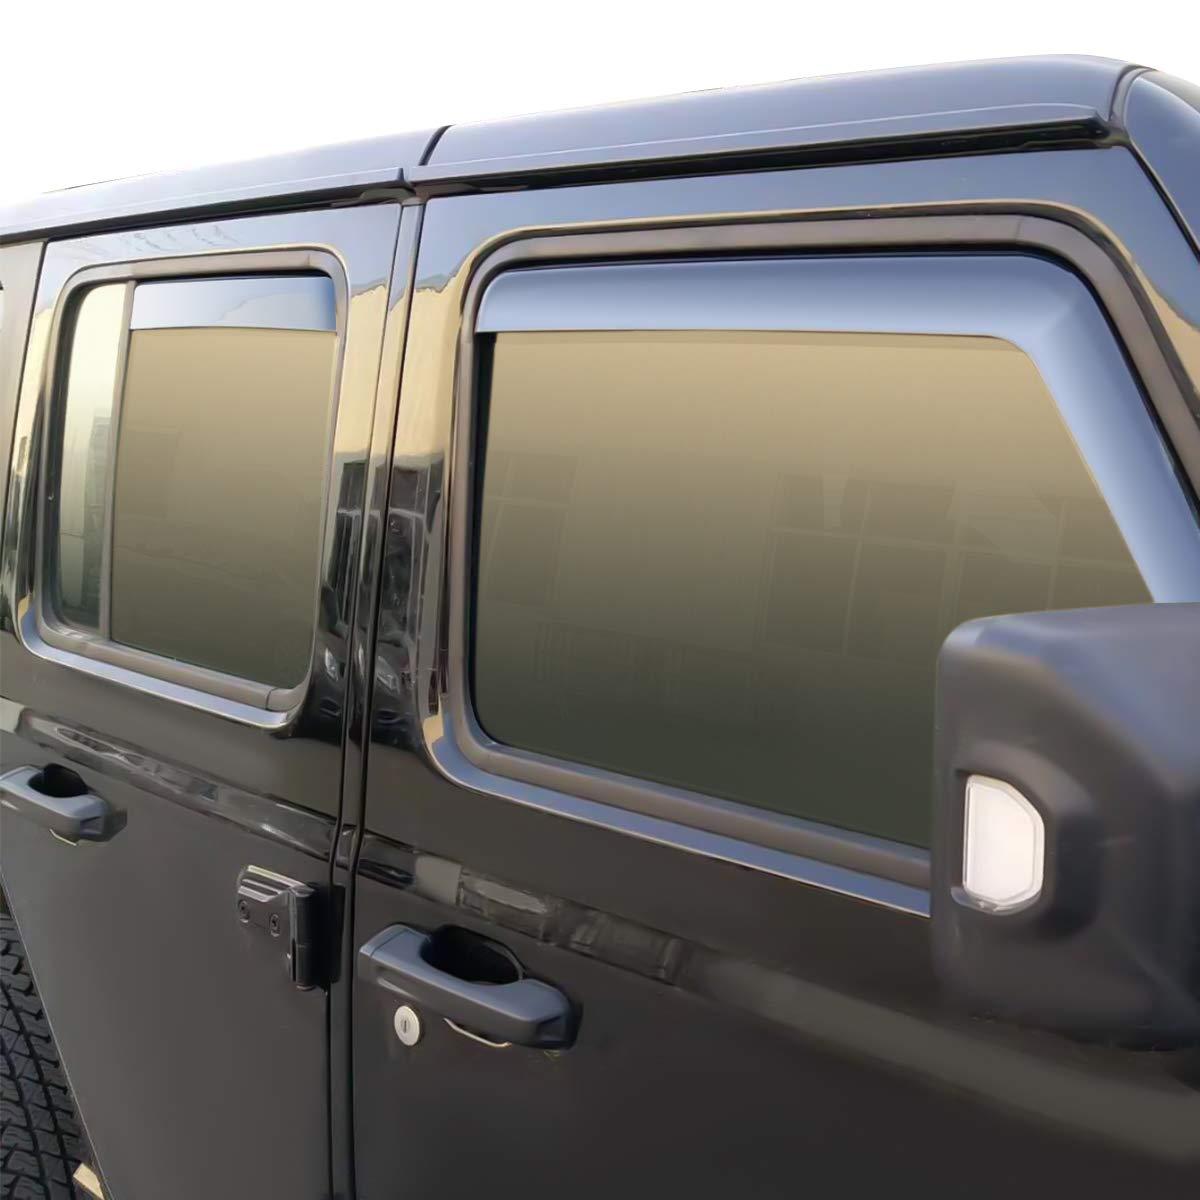 Spurtar Window Visor In-Channel Side Window Deflectors Windshield for 2007-2017 Jeep Wrangler Jk Dark Tint 4Pcs Set Rain /& Wind Guard Sun Shade Visor 4-Door